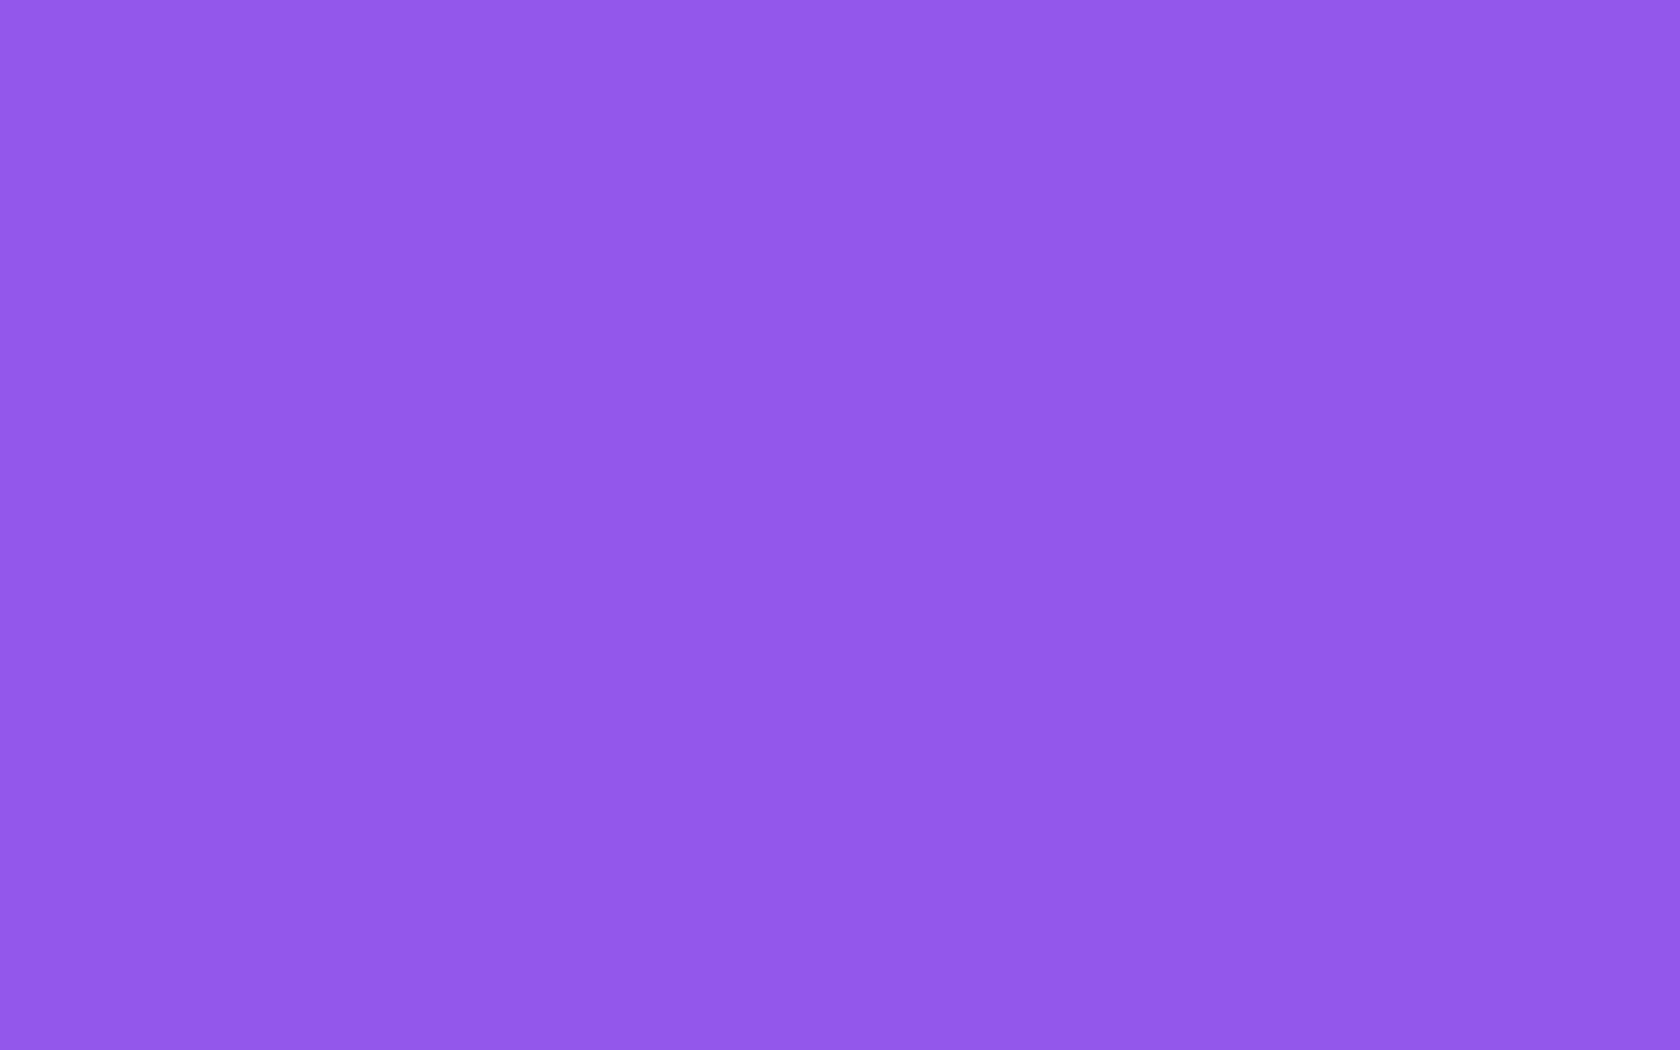 1680x1050 Lavender Indigo Solid Color Background